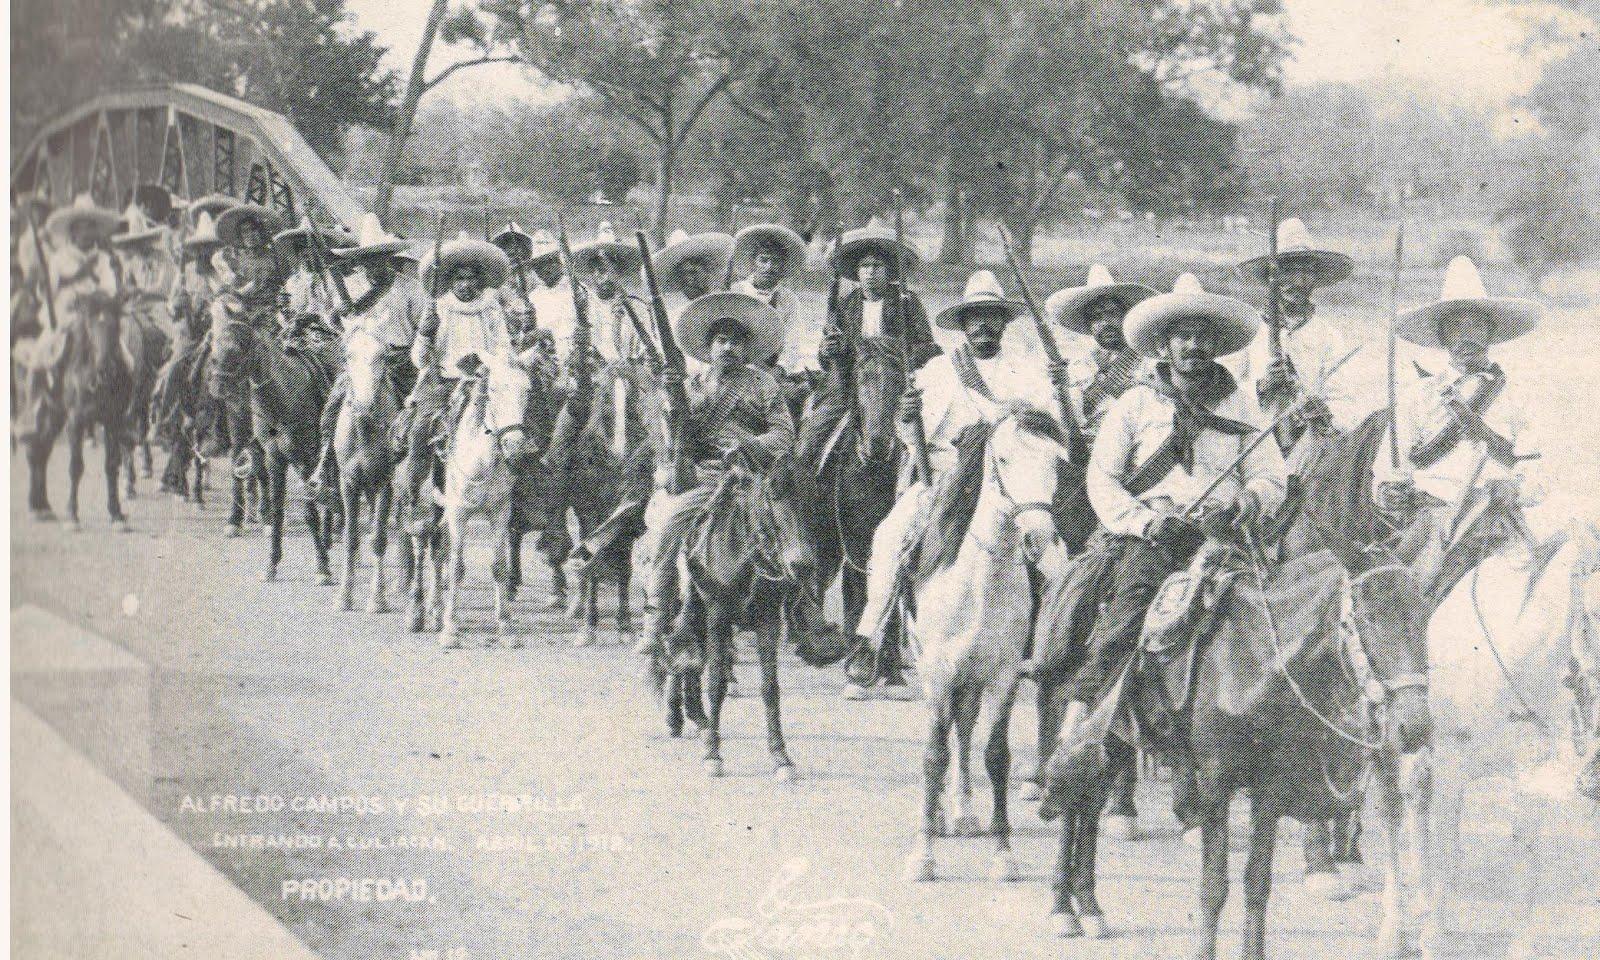 Fotos de la revolucion mexicana de 1910 94